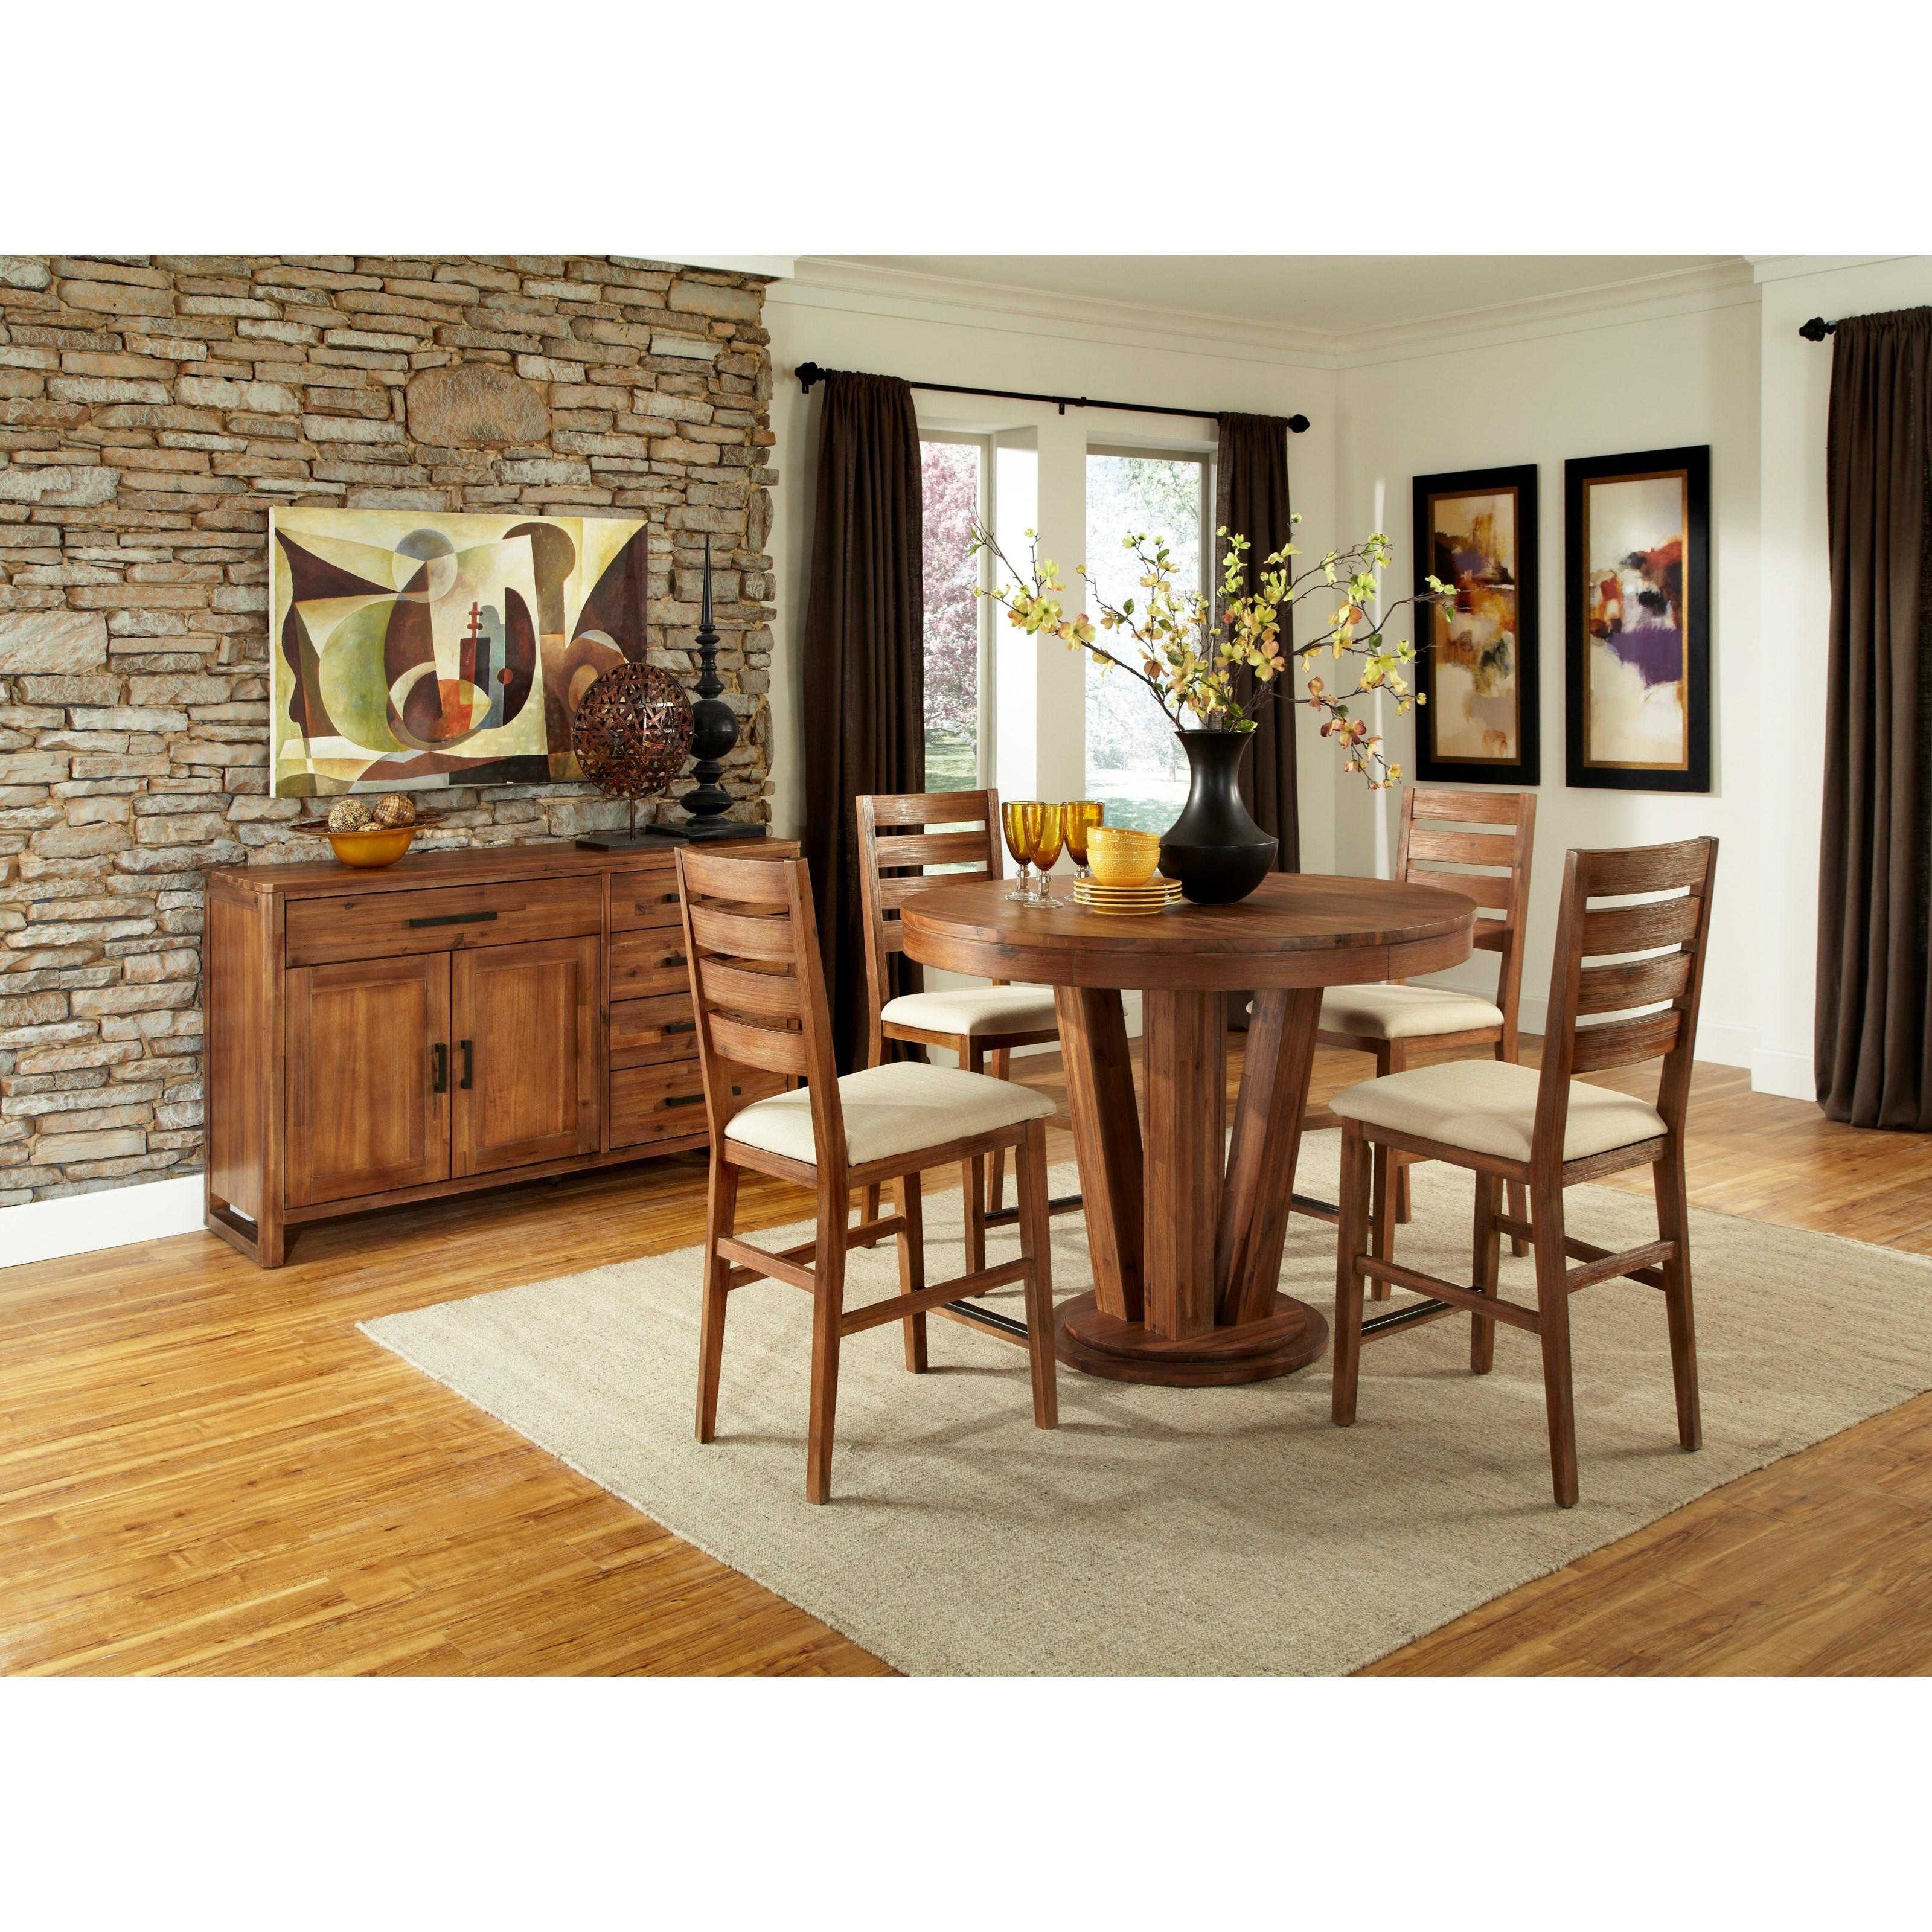 Cresent dining room furniture